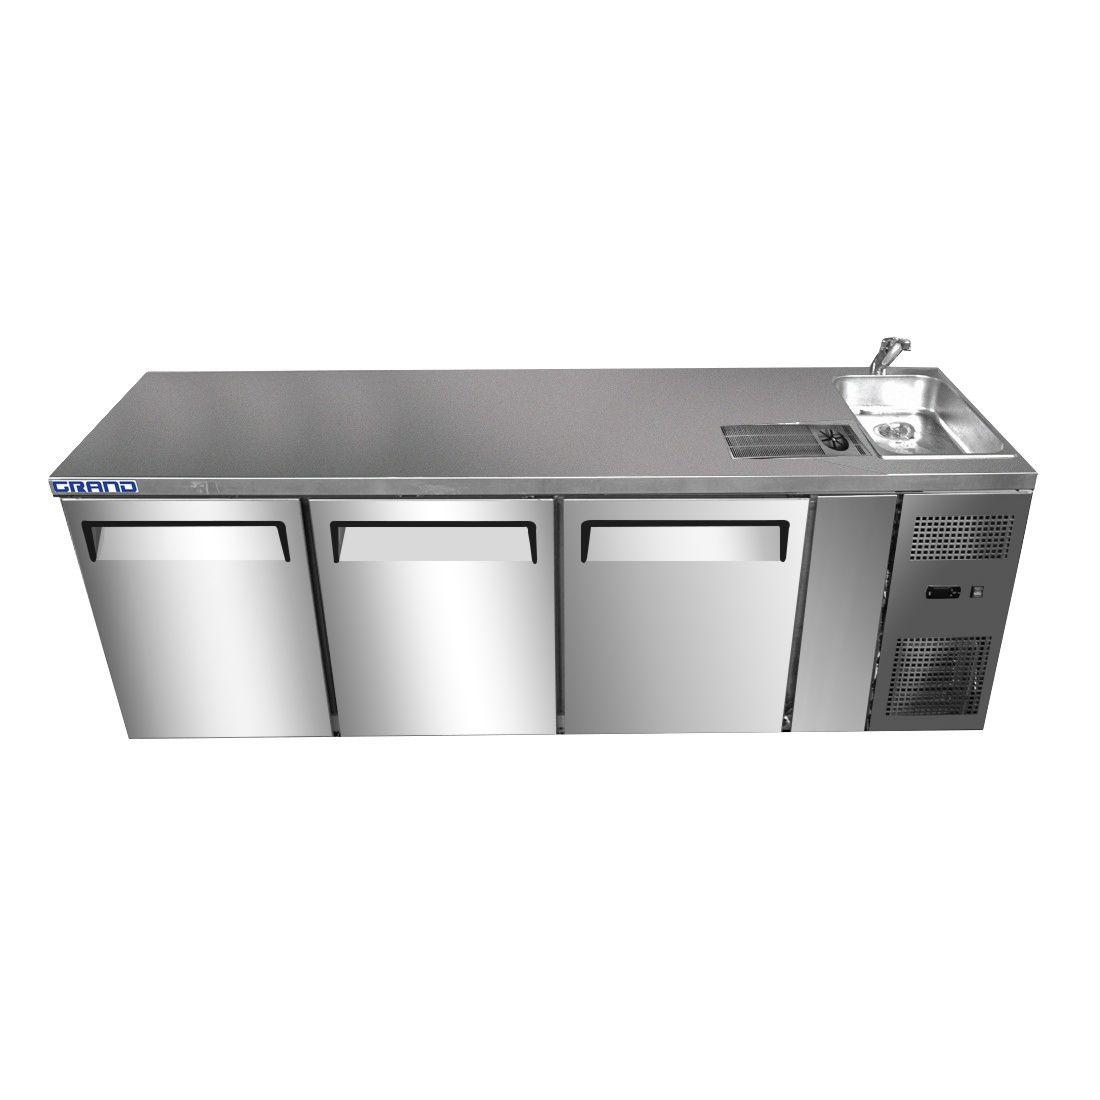 GTR3100BS GRAND True Quality Three Door Work Bench Fridge with Sink